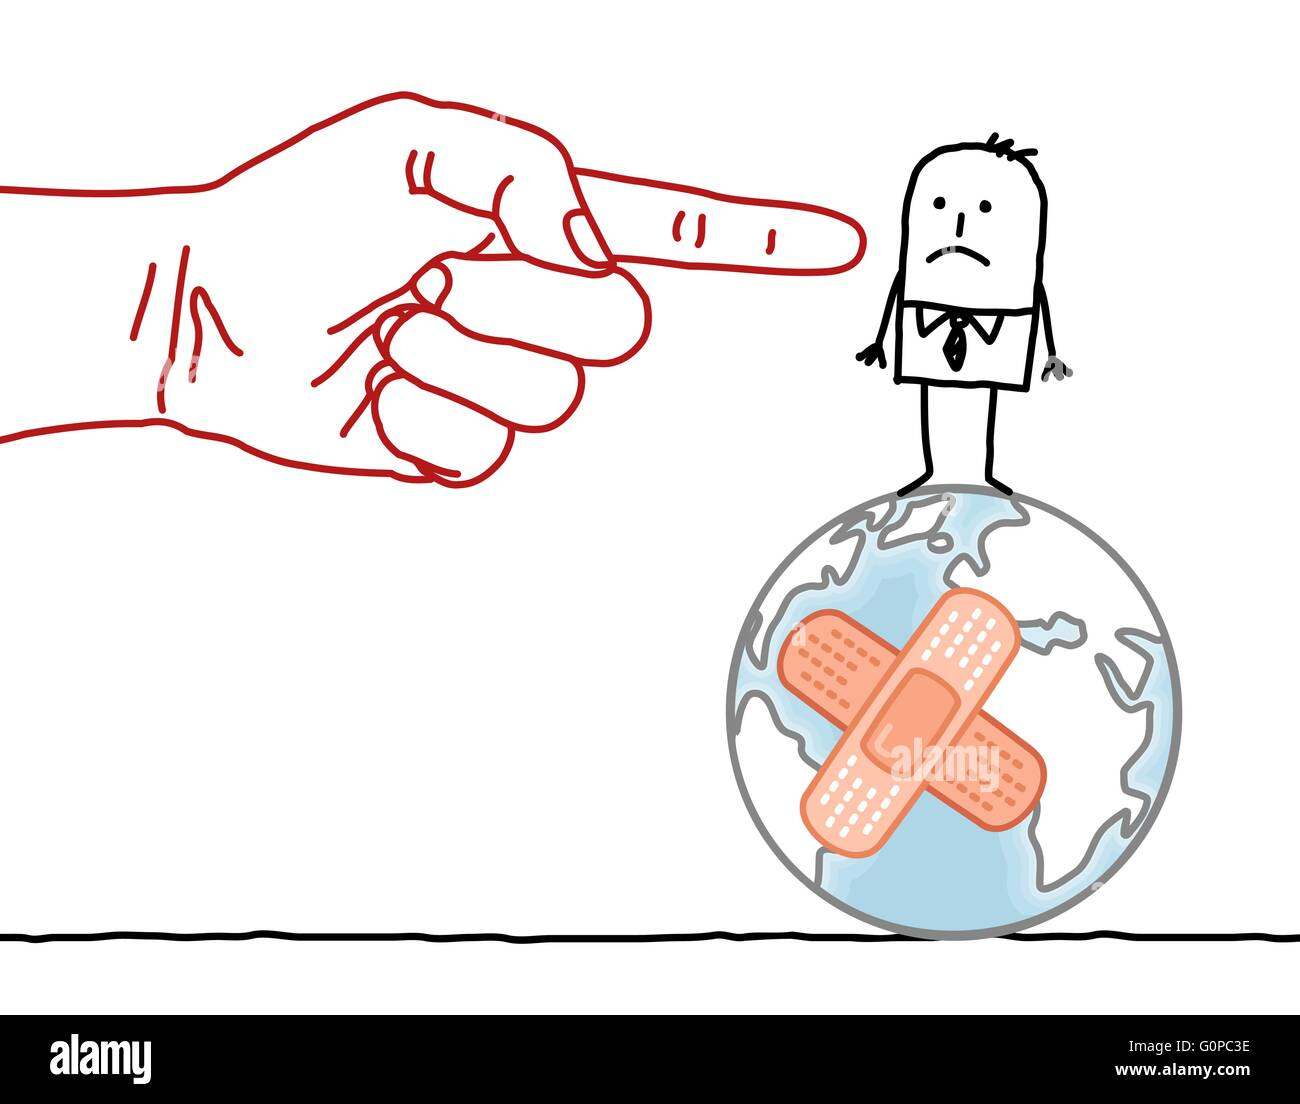 big hand and cartoon character - man on damaged Earth - Stock Image